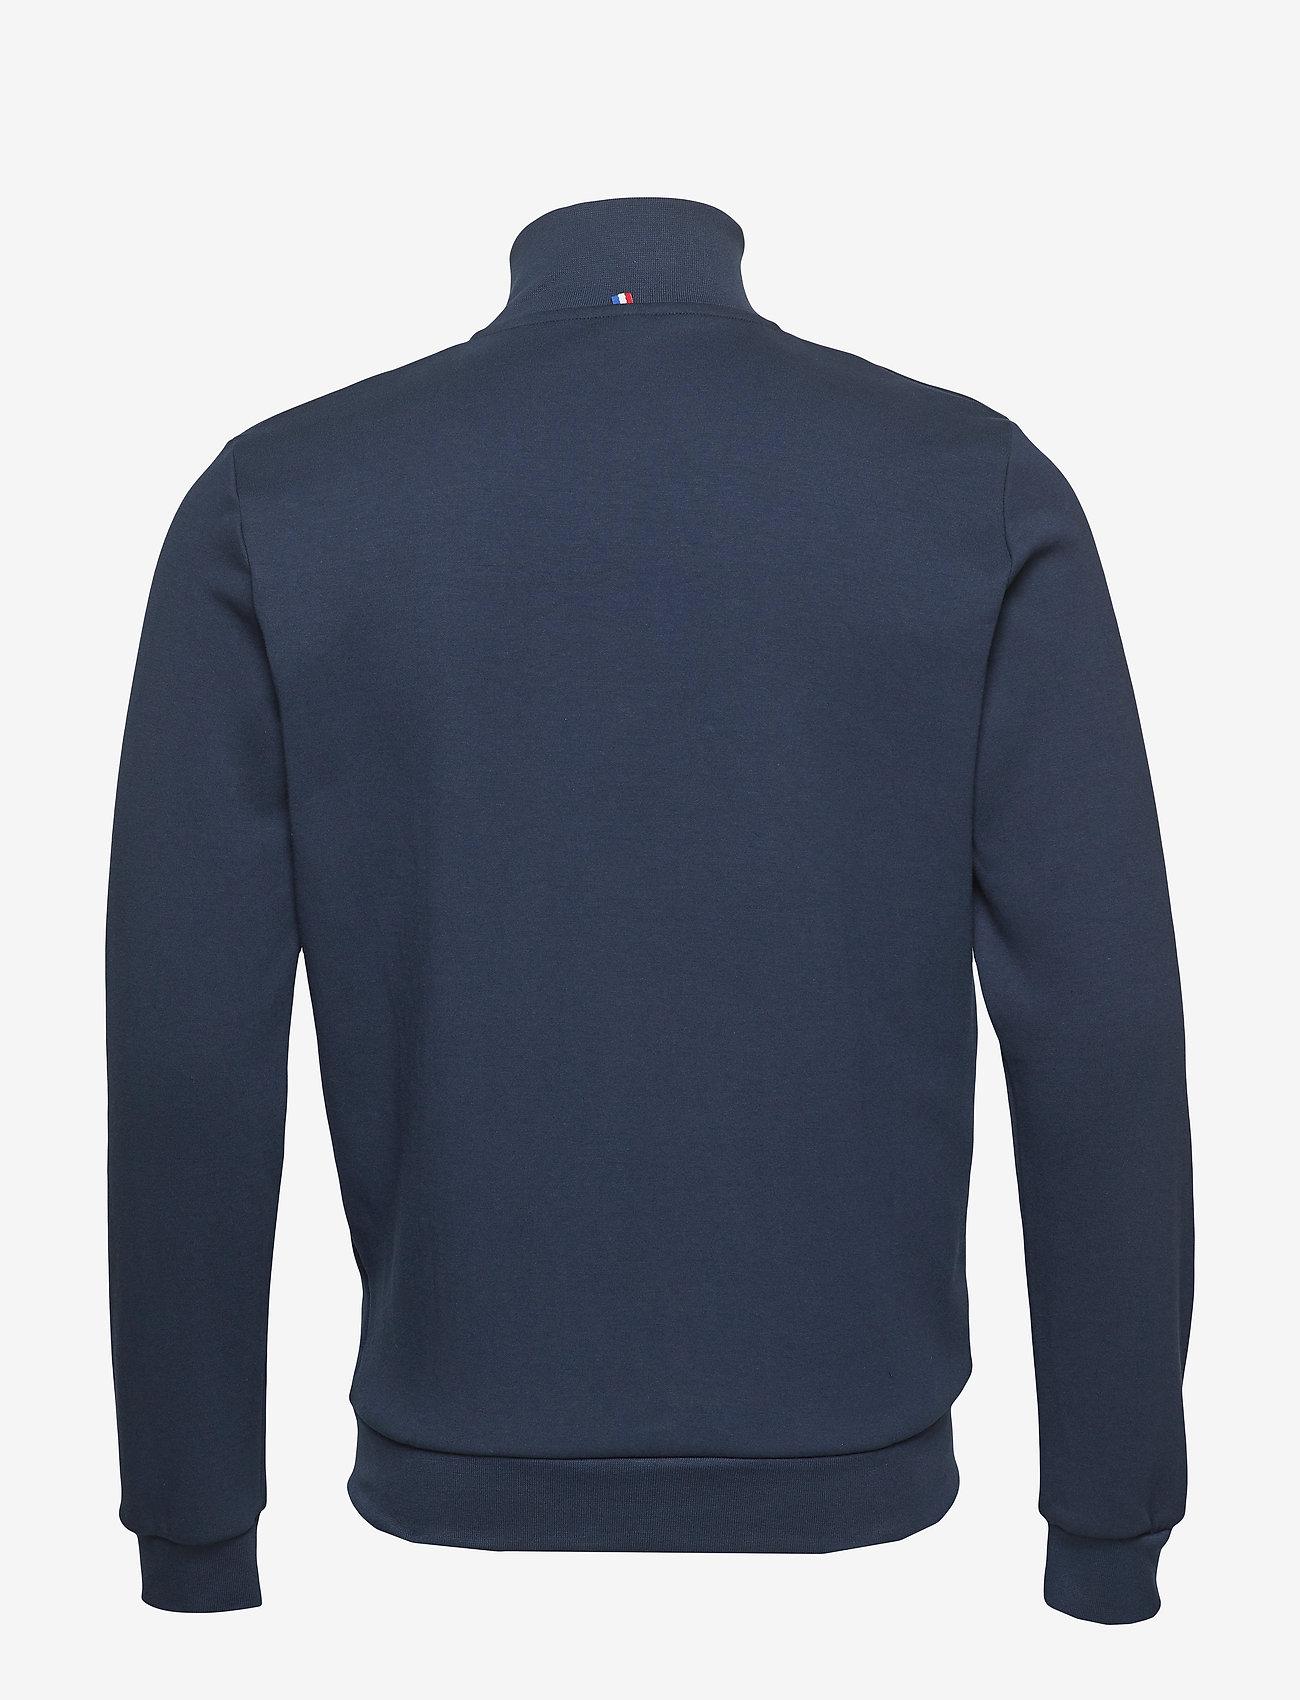 Ess Fz Sweat N°1 M (Dress Blues) (799.20 kr) - Le Coq Sportif